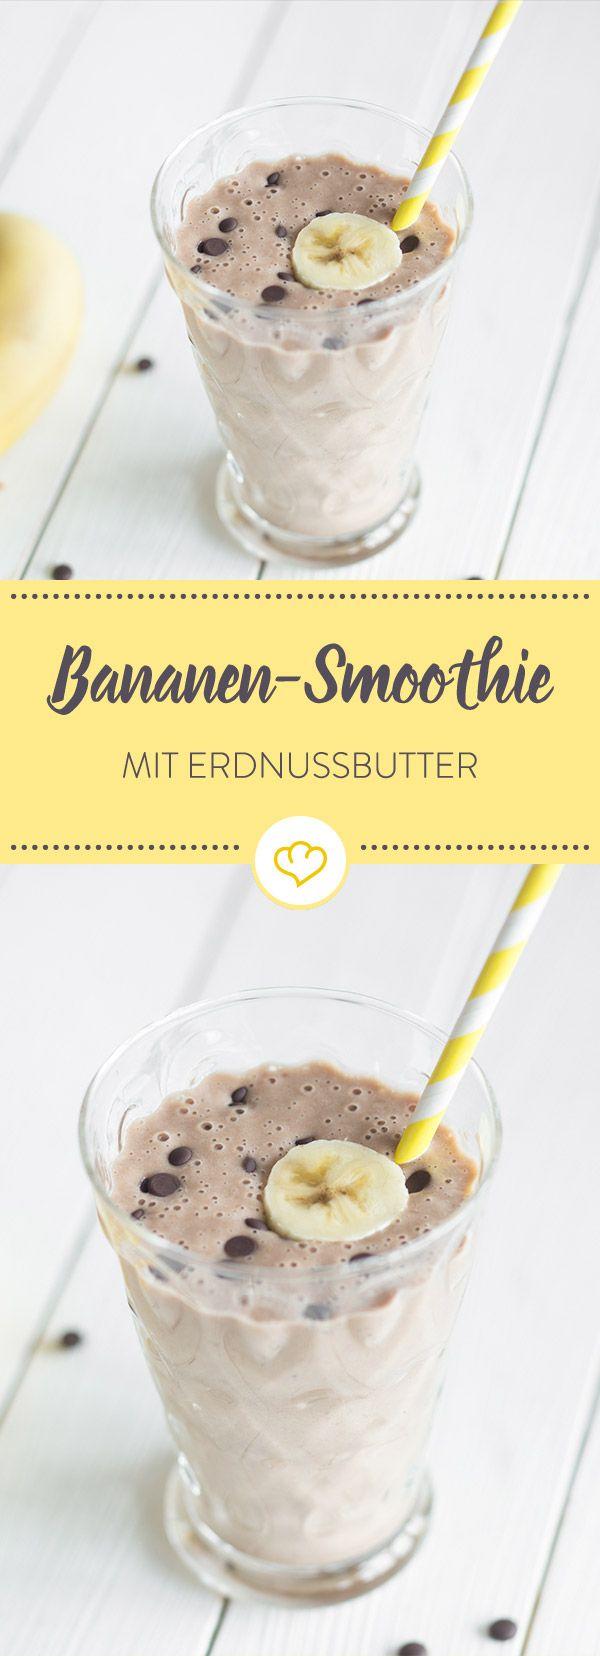 smoothie mit banane kakao und erdnussbutter rezept. Black Bedroom Furniture Sets. Home Design Ideas